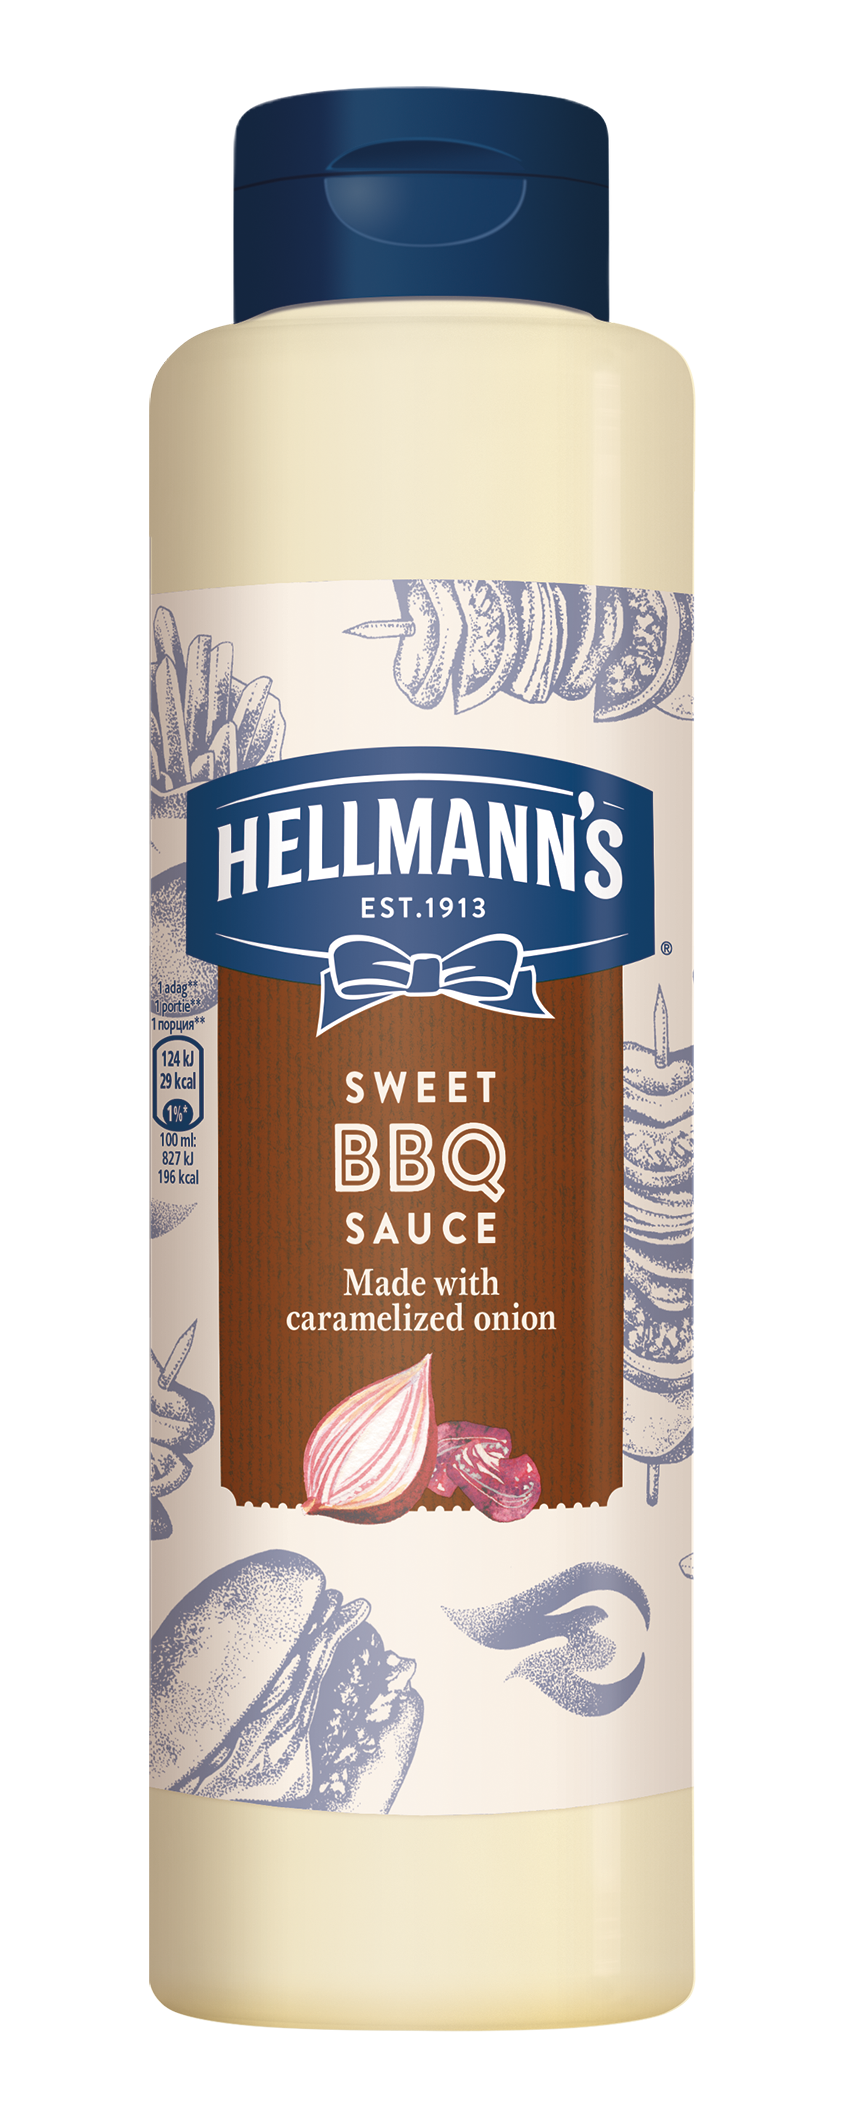 Hellmann's BBQ Omaka za žar 792 ml - Svojim gostom pokažite kakovost